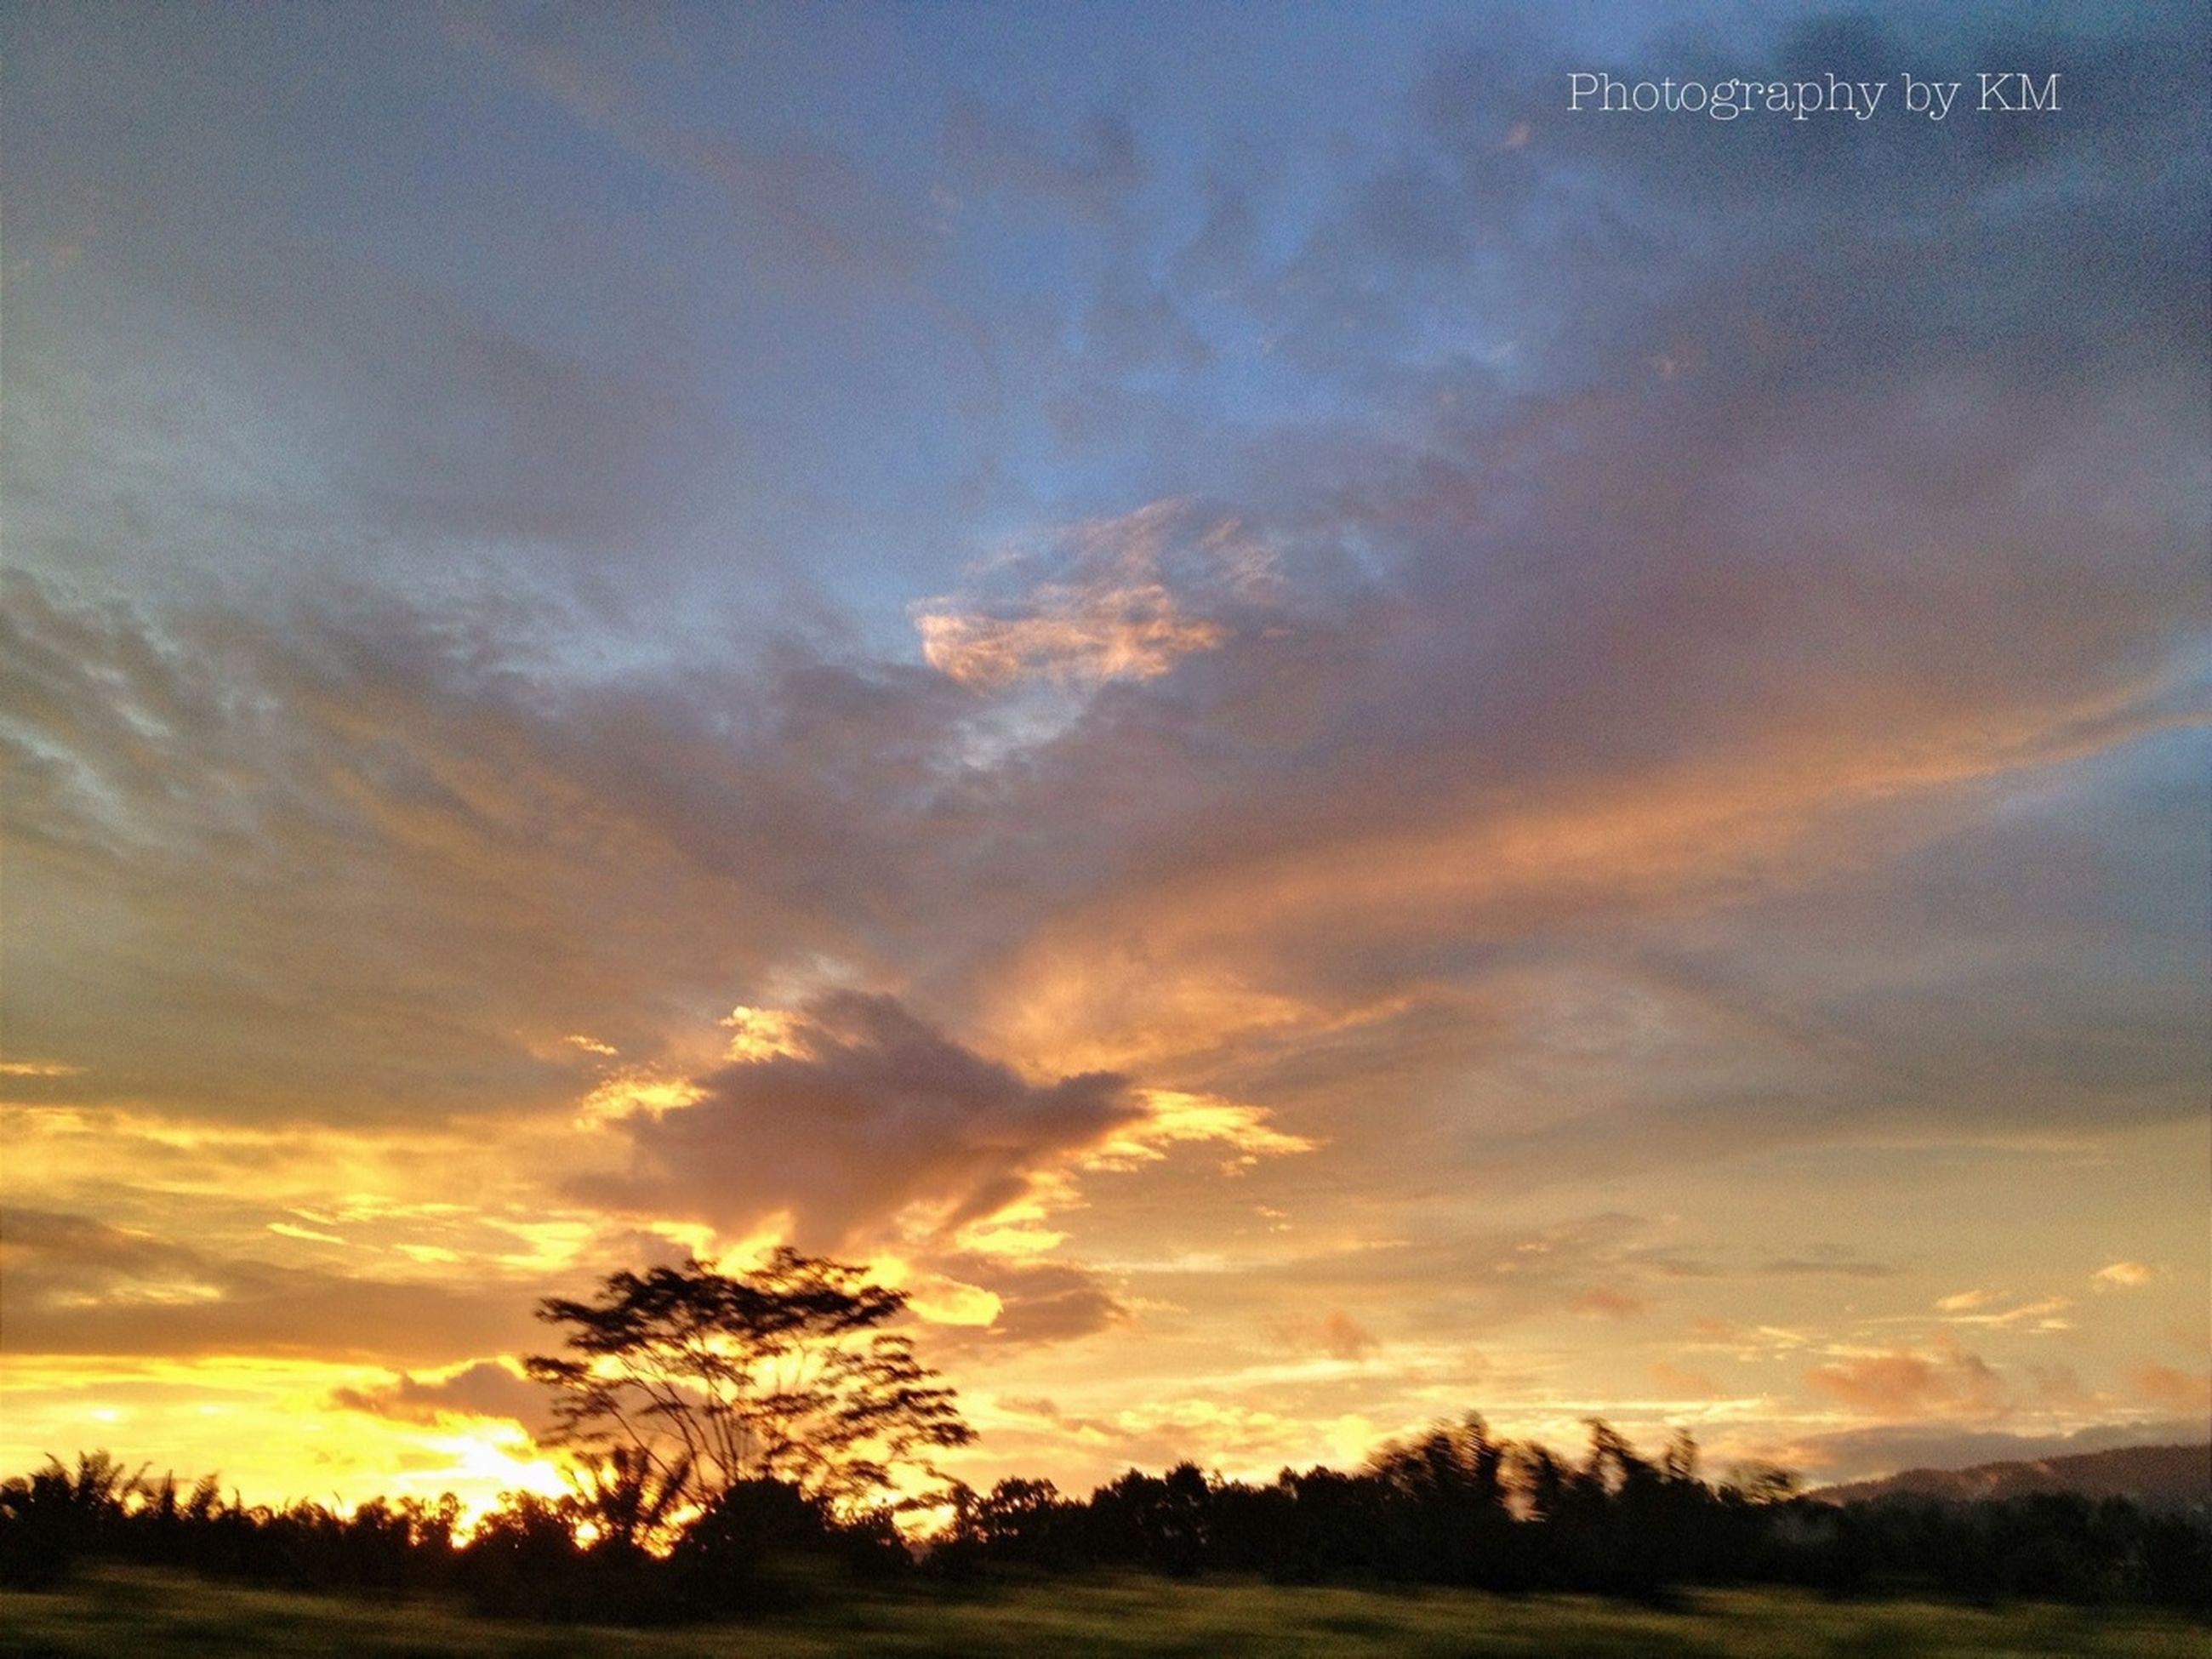 sunset, sky, tranquil scene, scenics, tranquility, beauty in nature, silhouette, orange color, cloud - sky, tree, nature, idyllic, dramatic sky, landscape, cloud, field, moody sky, outdoors, majestic, sun